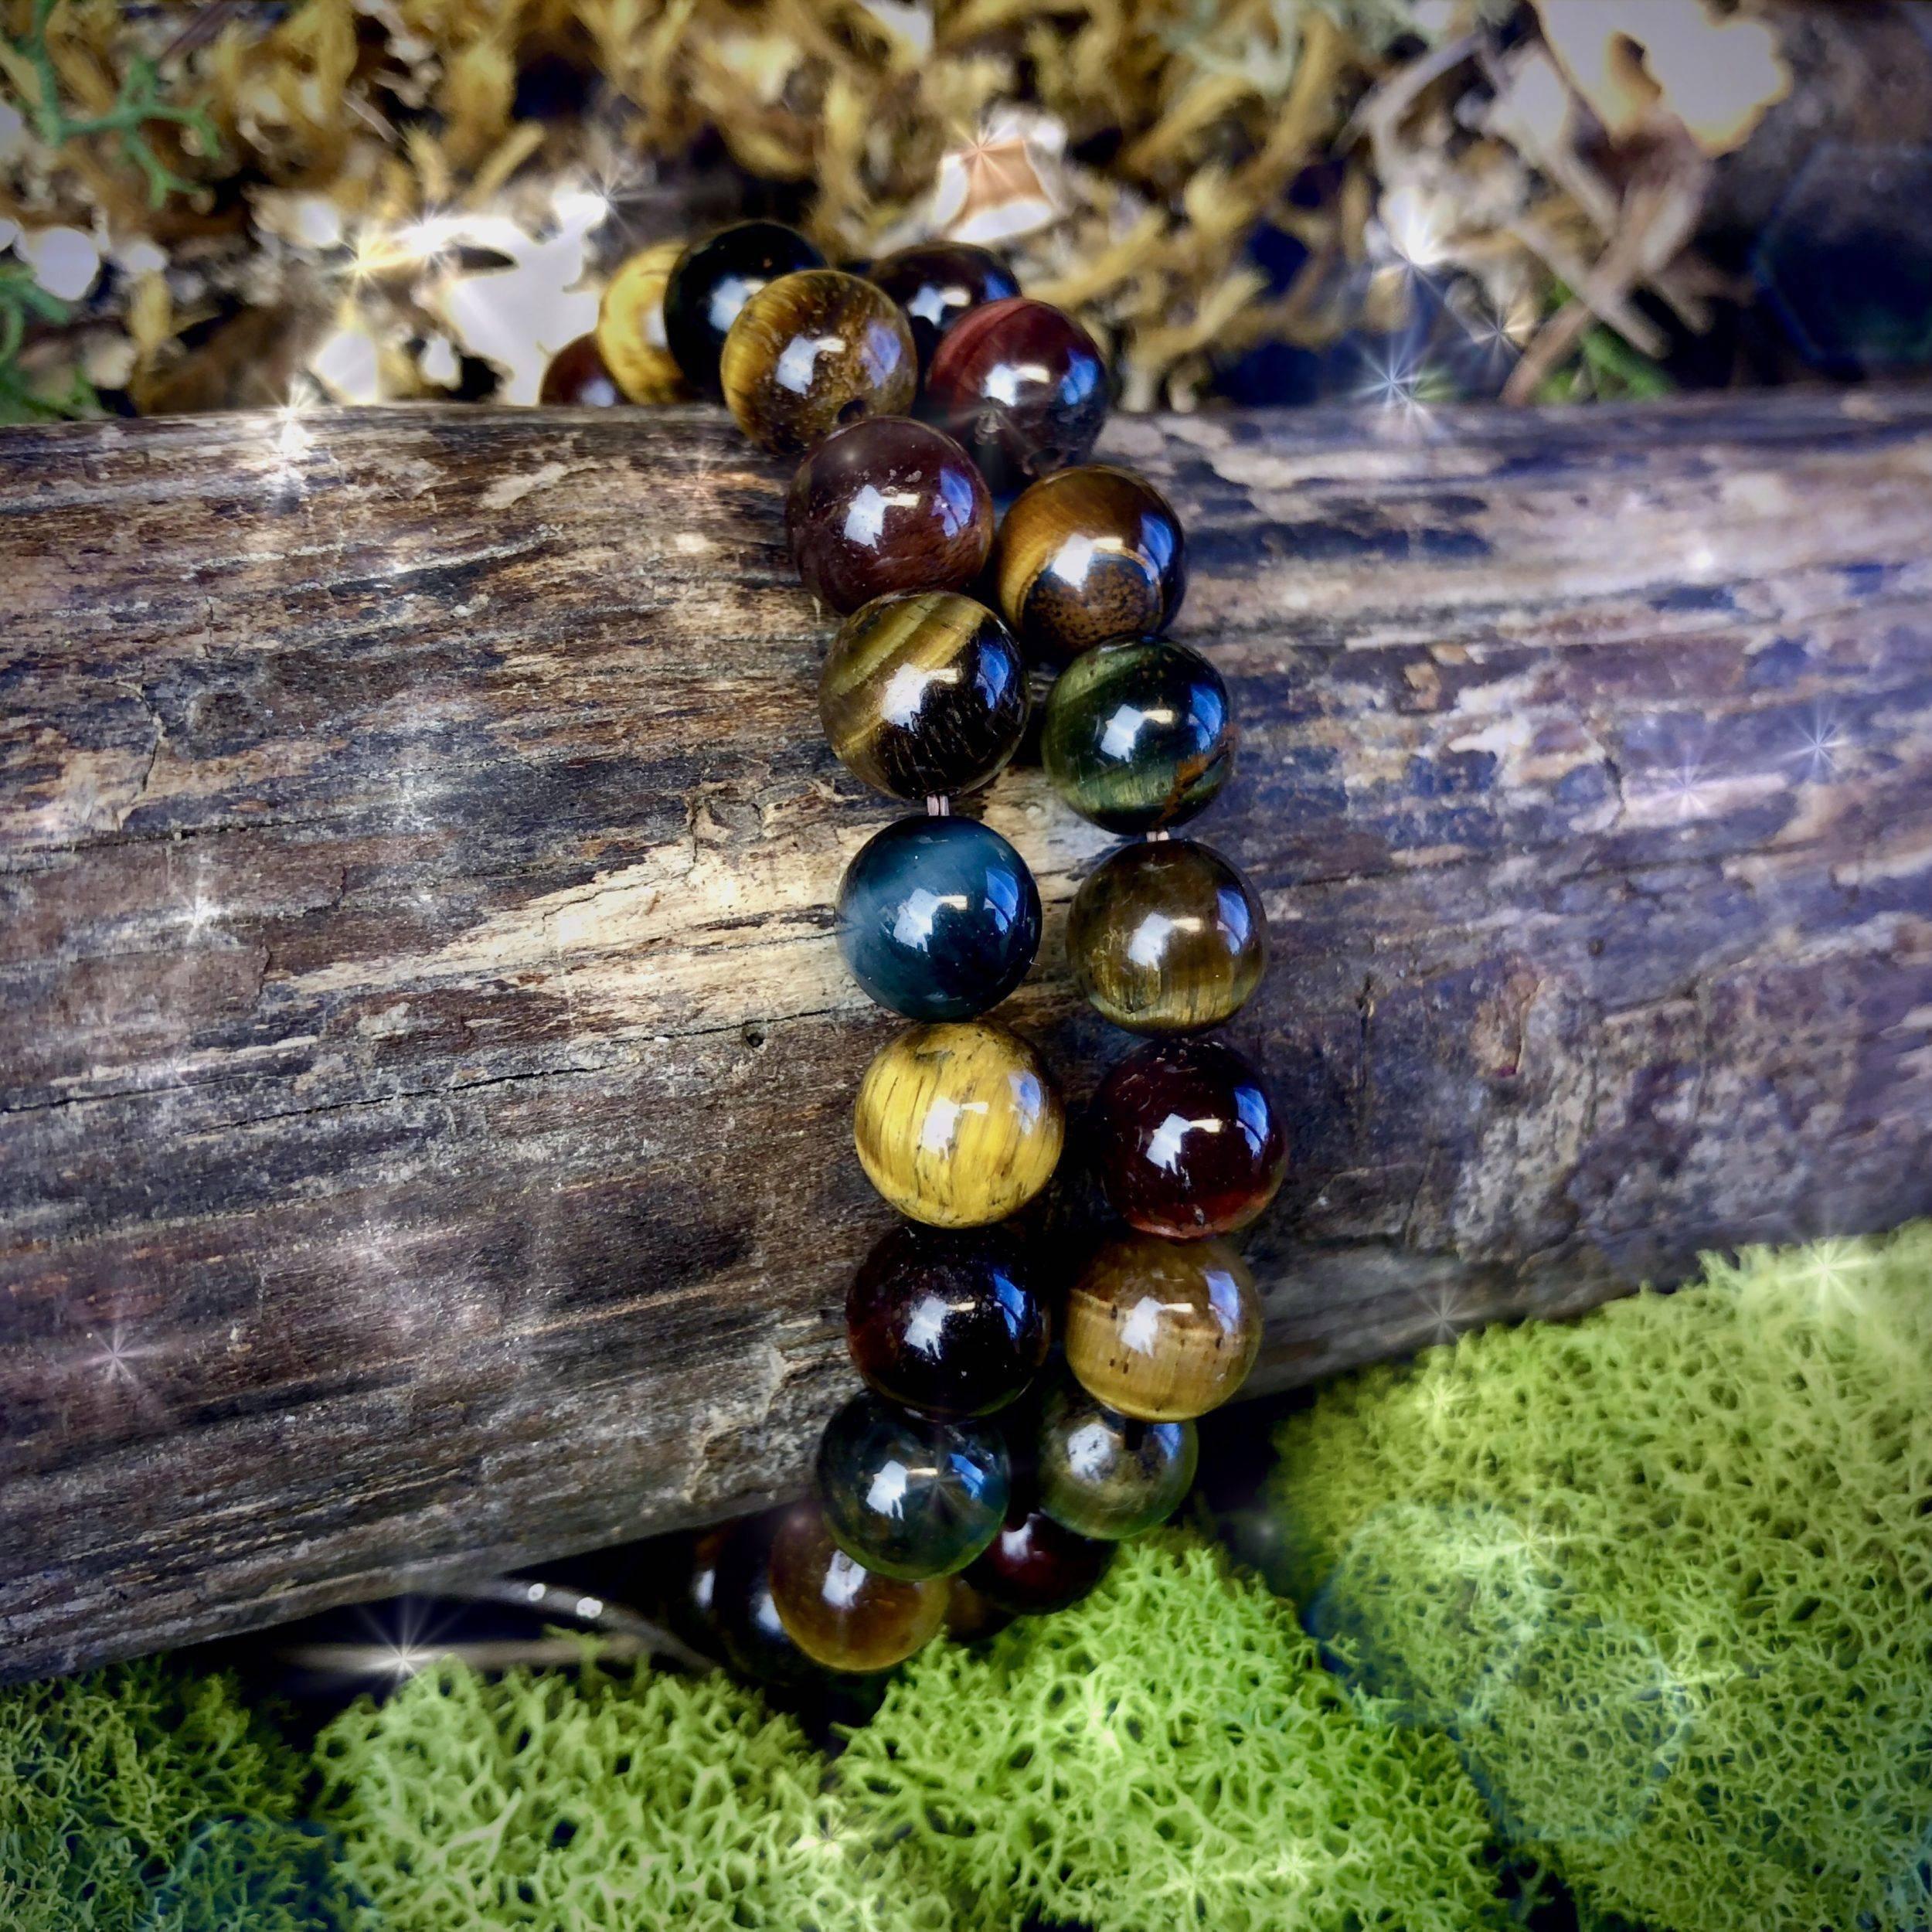 Wisdom_and_Protection_Journey_Bracelets_DD_Round Mixed Tiger's Eye Bracelet_4of6_9_26